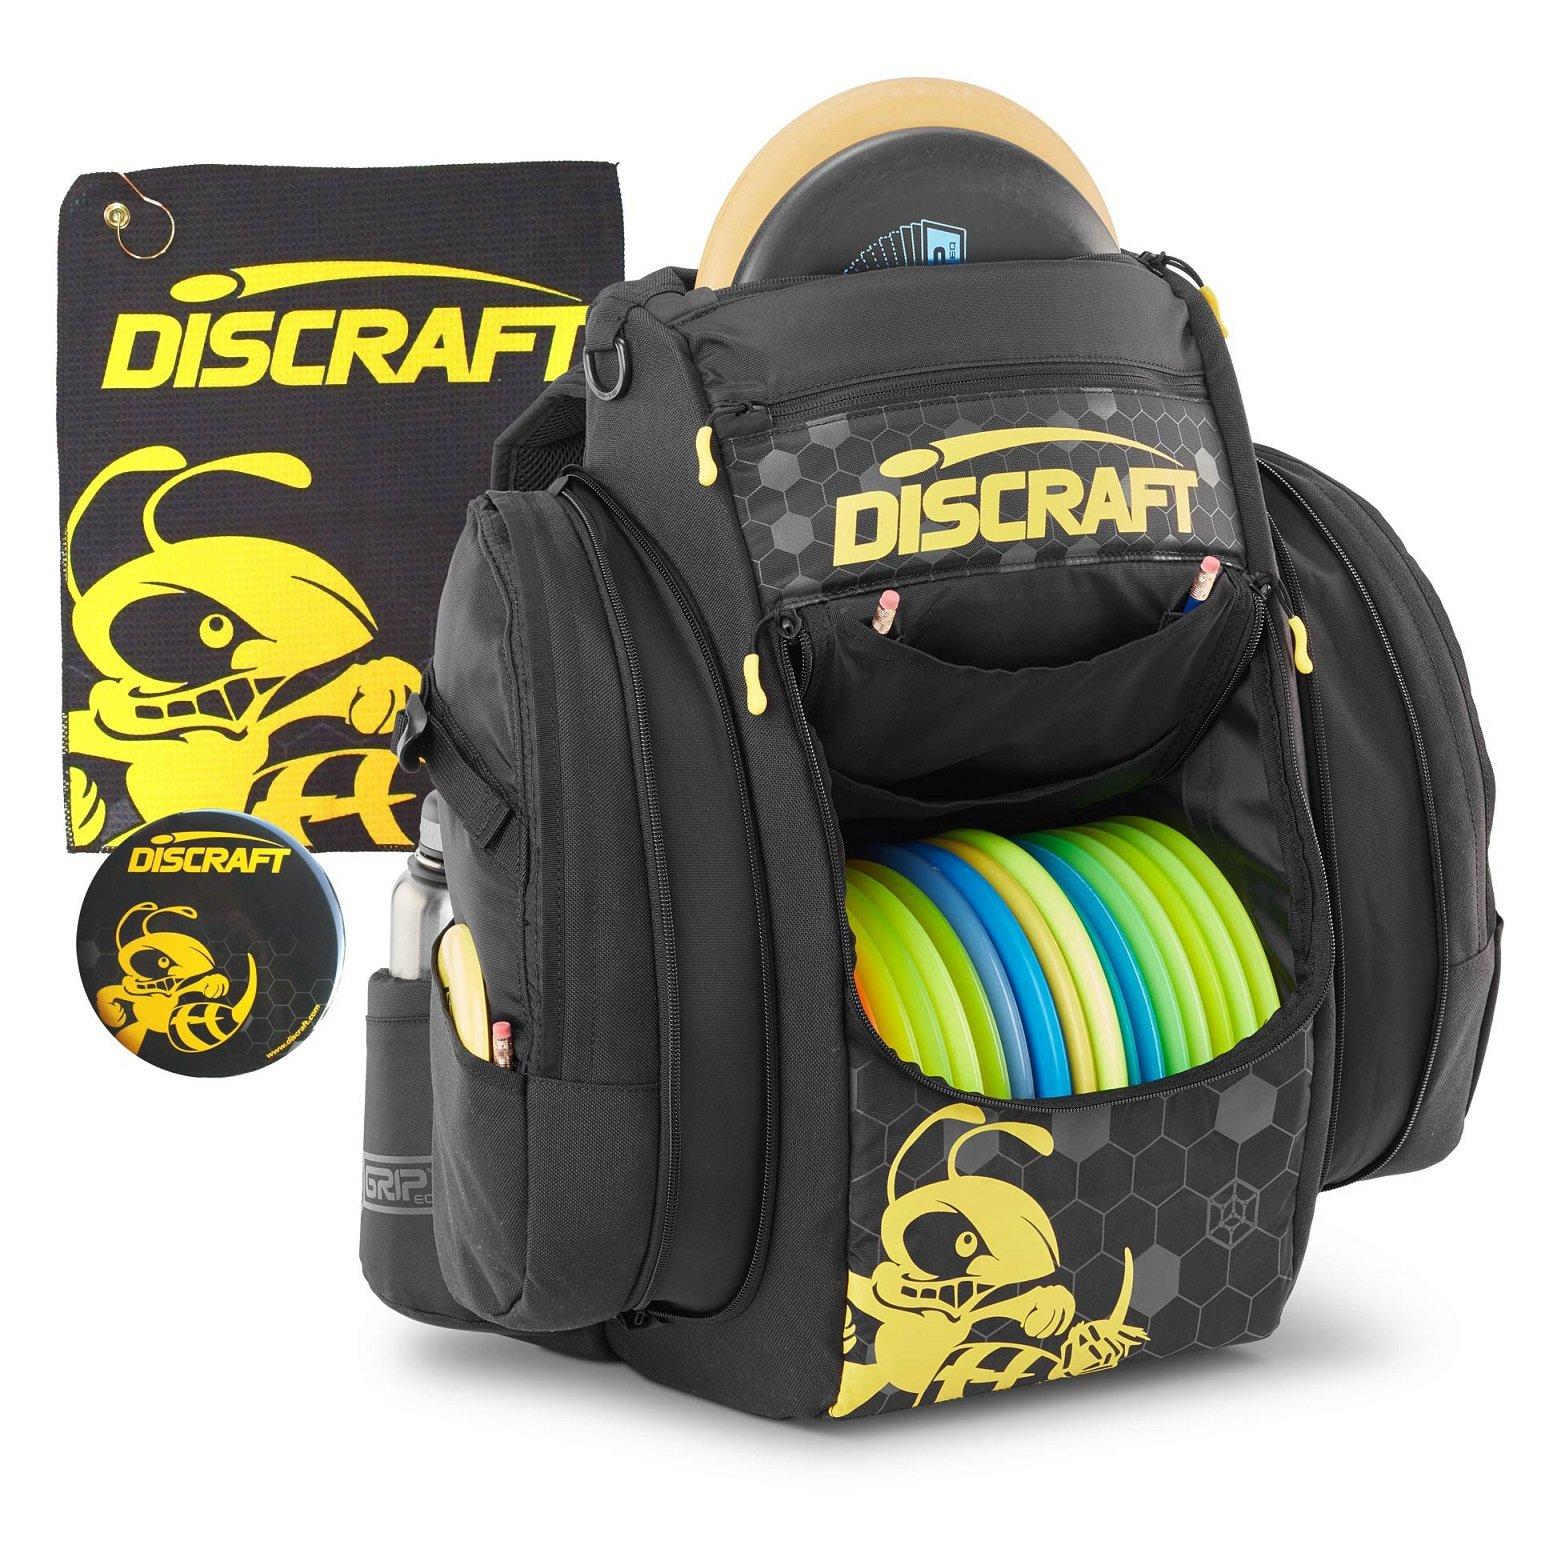 Discraft Grip EQ BX BUZZZ Disc Golf Bag (Coal) by Discraft